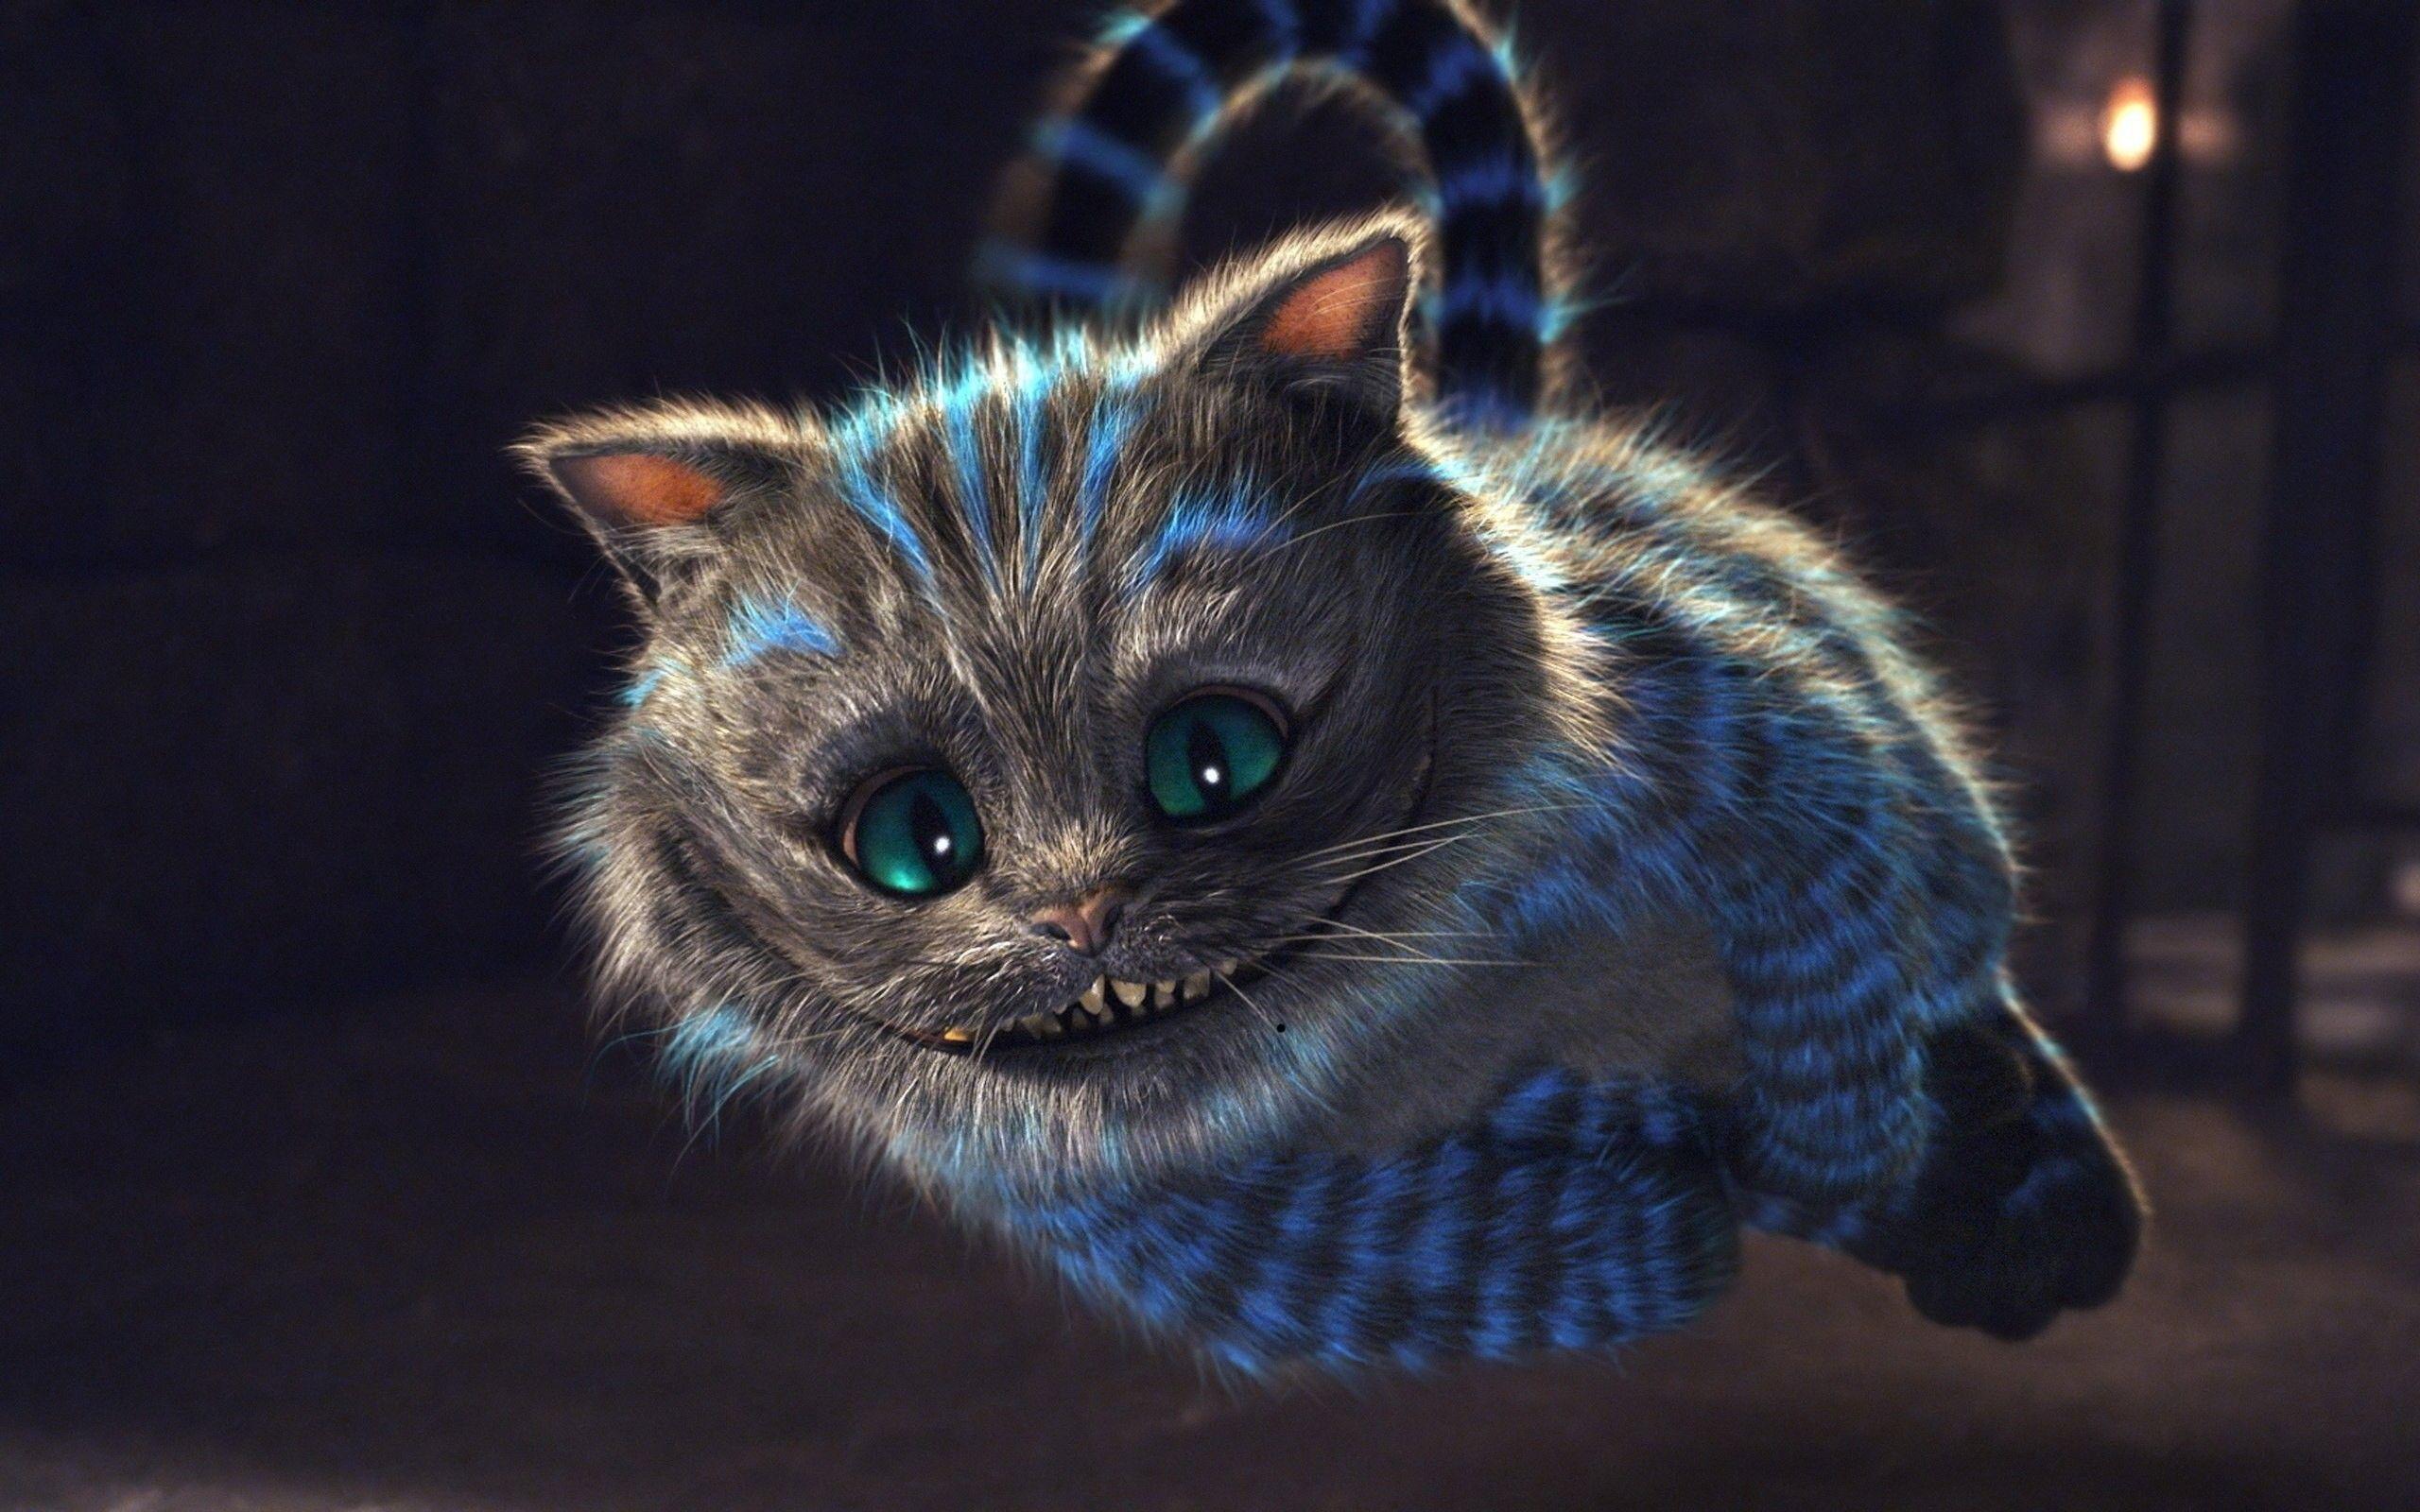 Most Inspiring Wallpaper Cat Mystical - e3cba36654b90204deb1dc8544560f38  Gallery_41416 .jpg